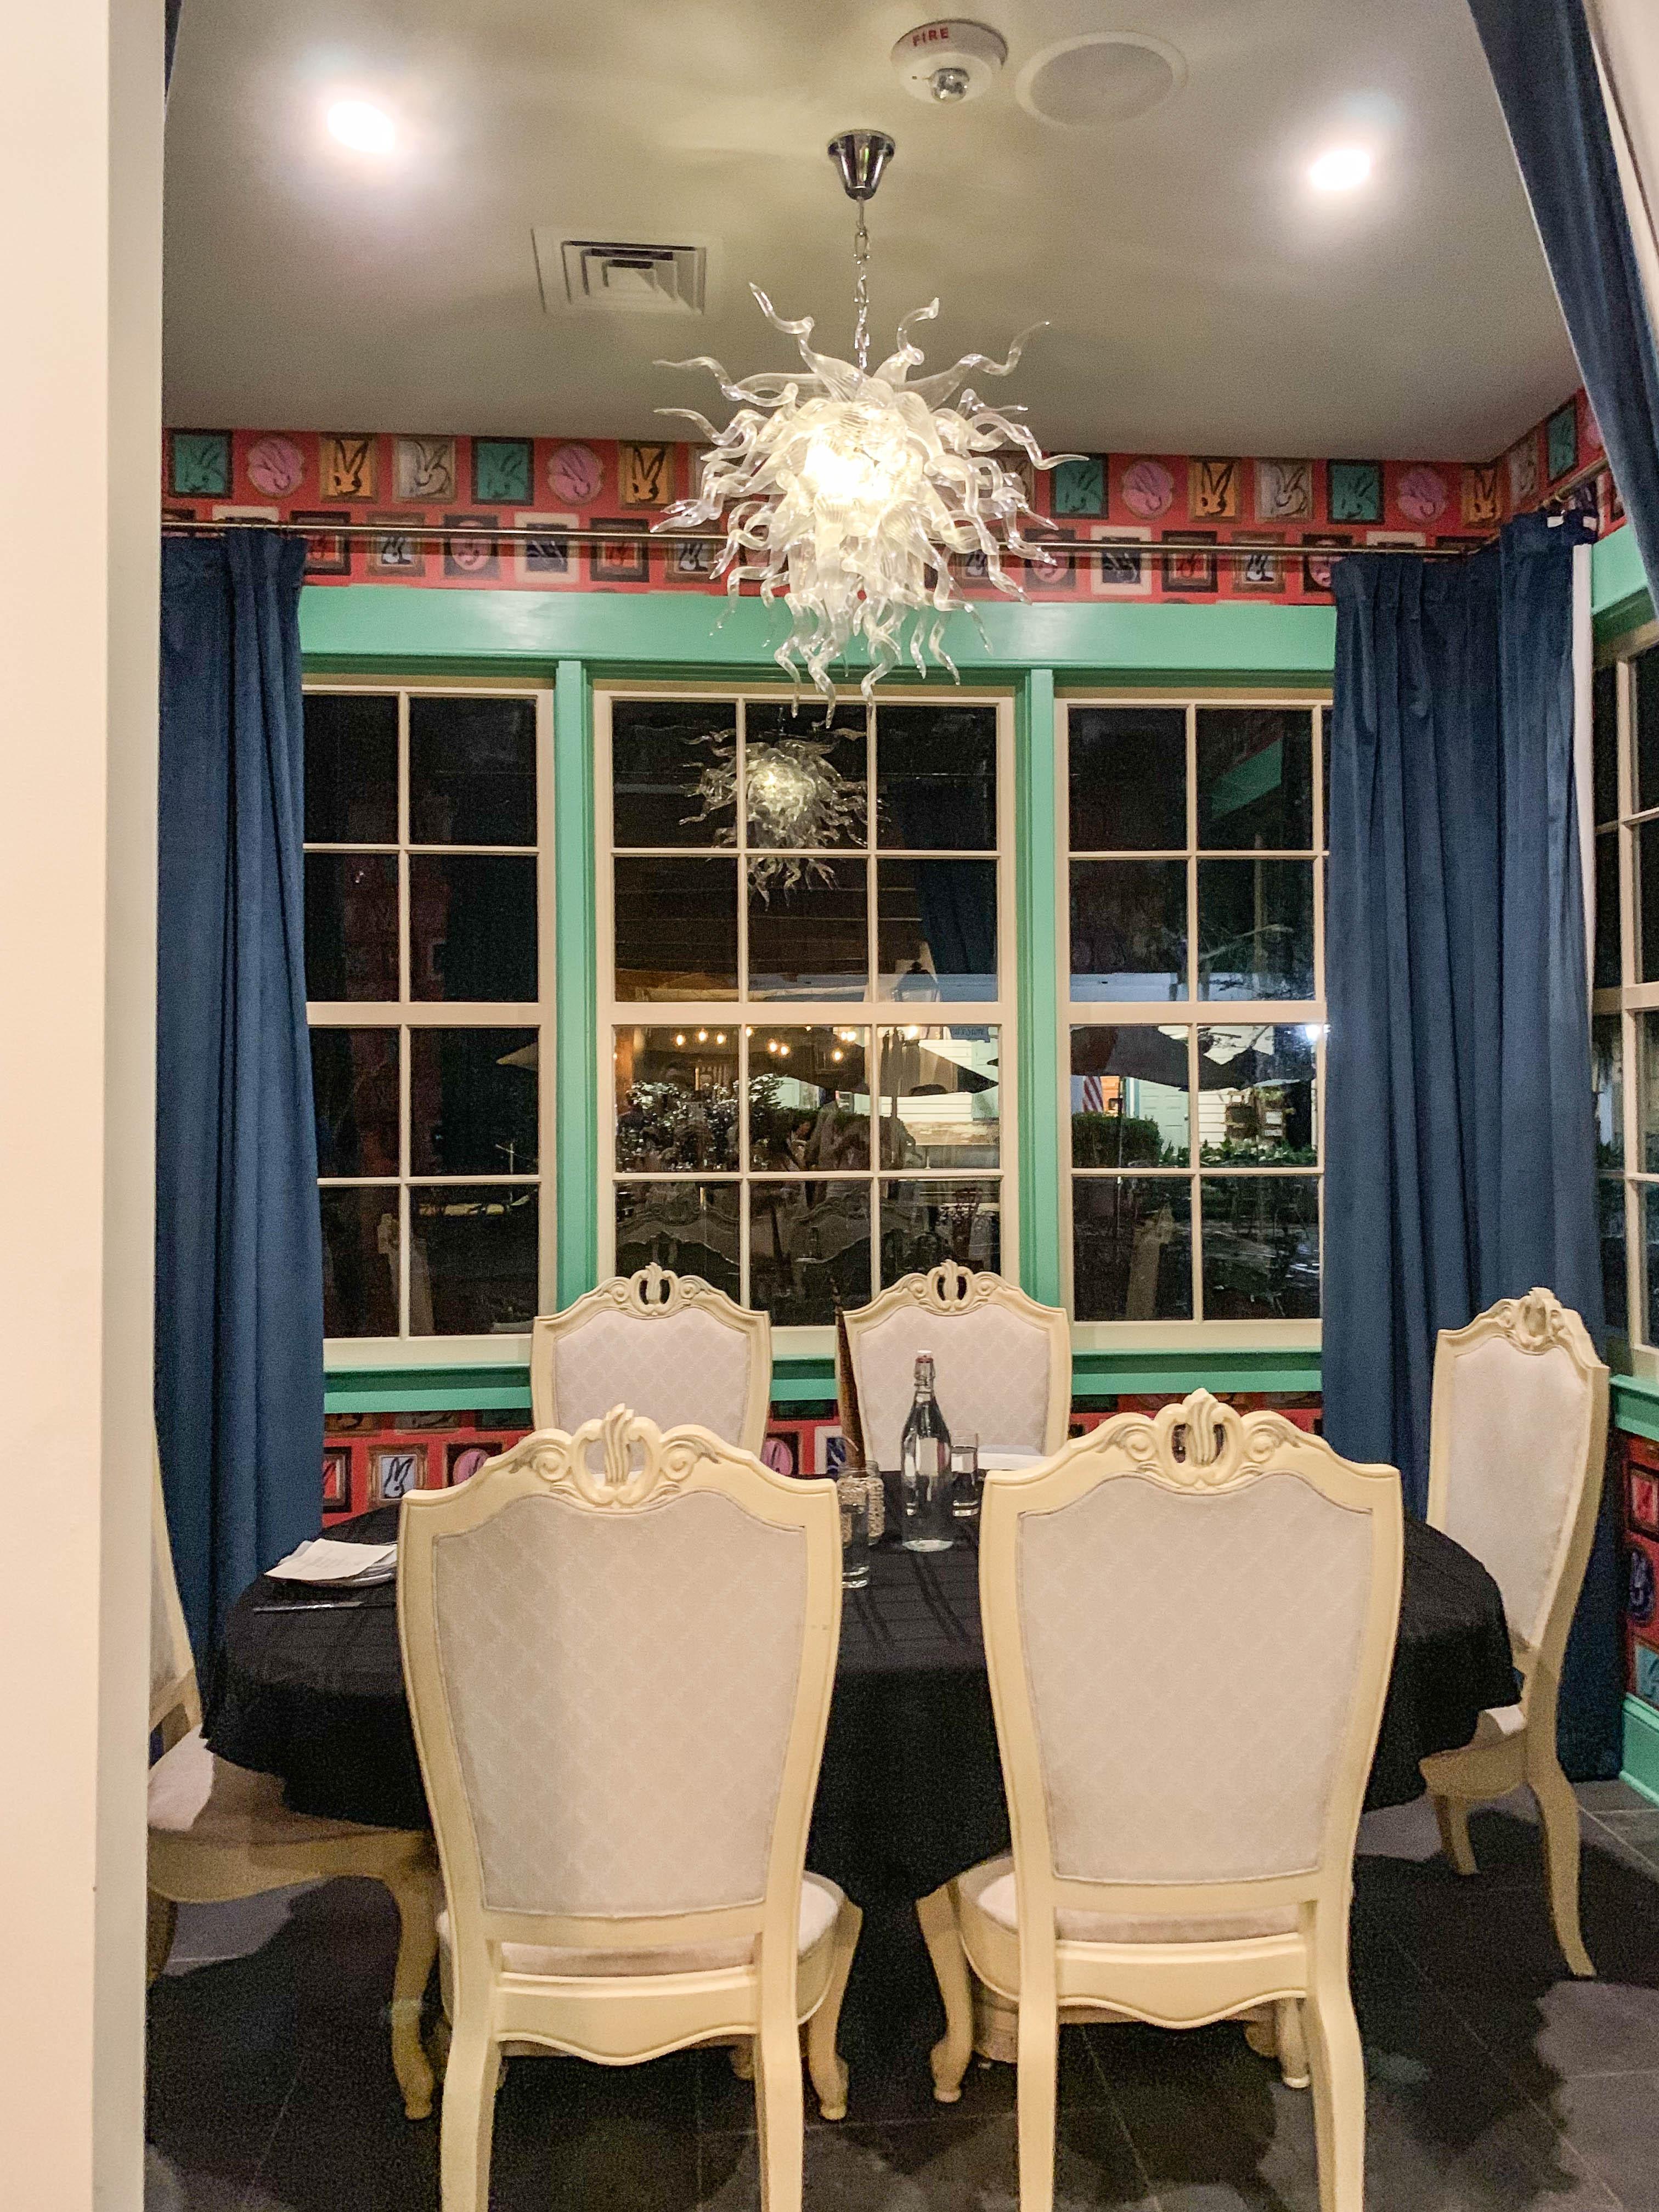 Restaurant 1796 bunny room